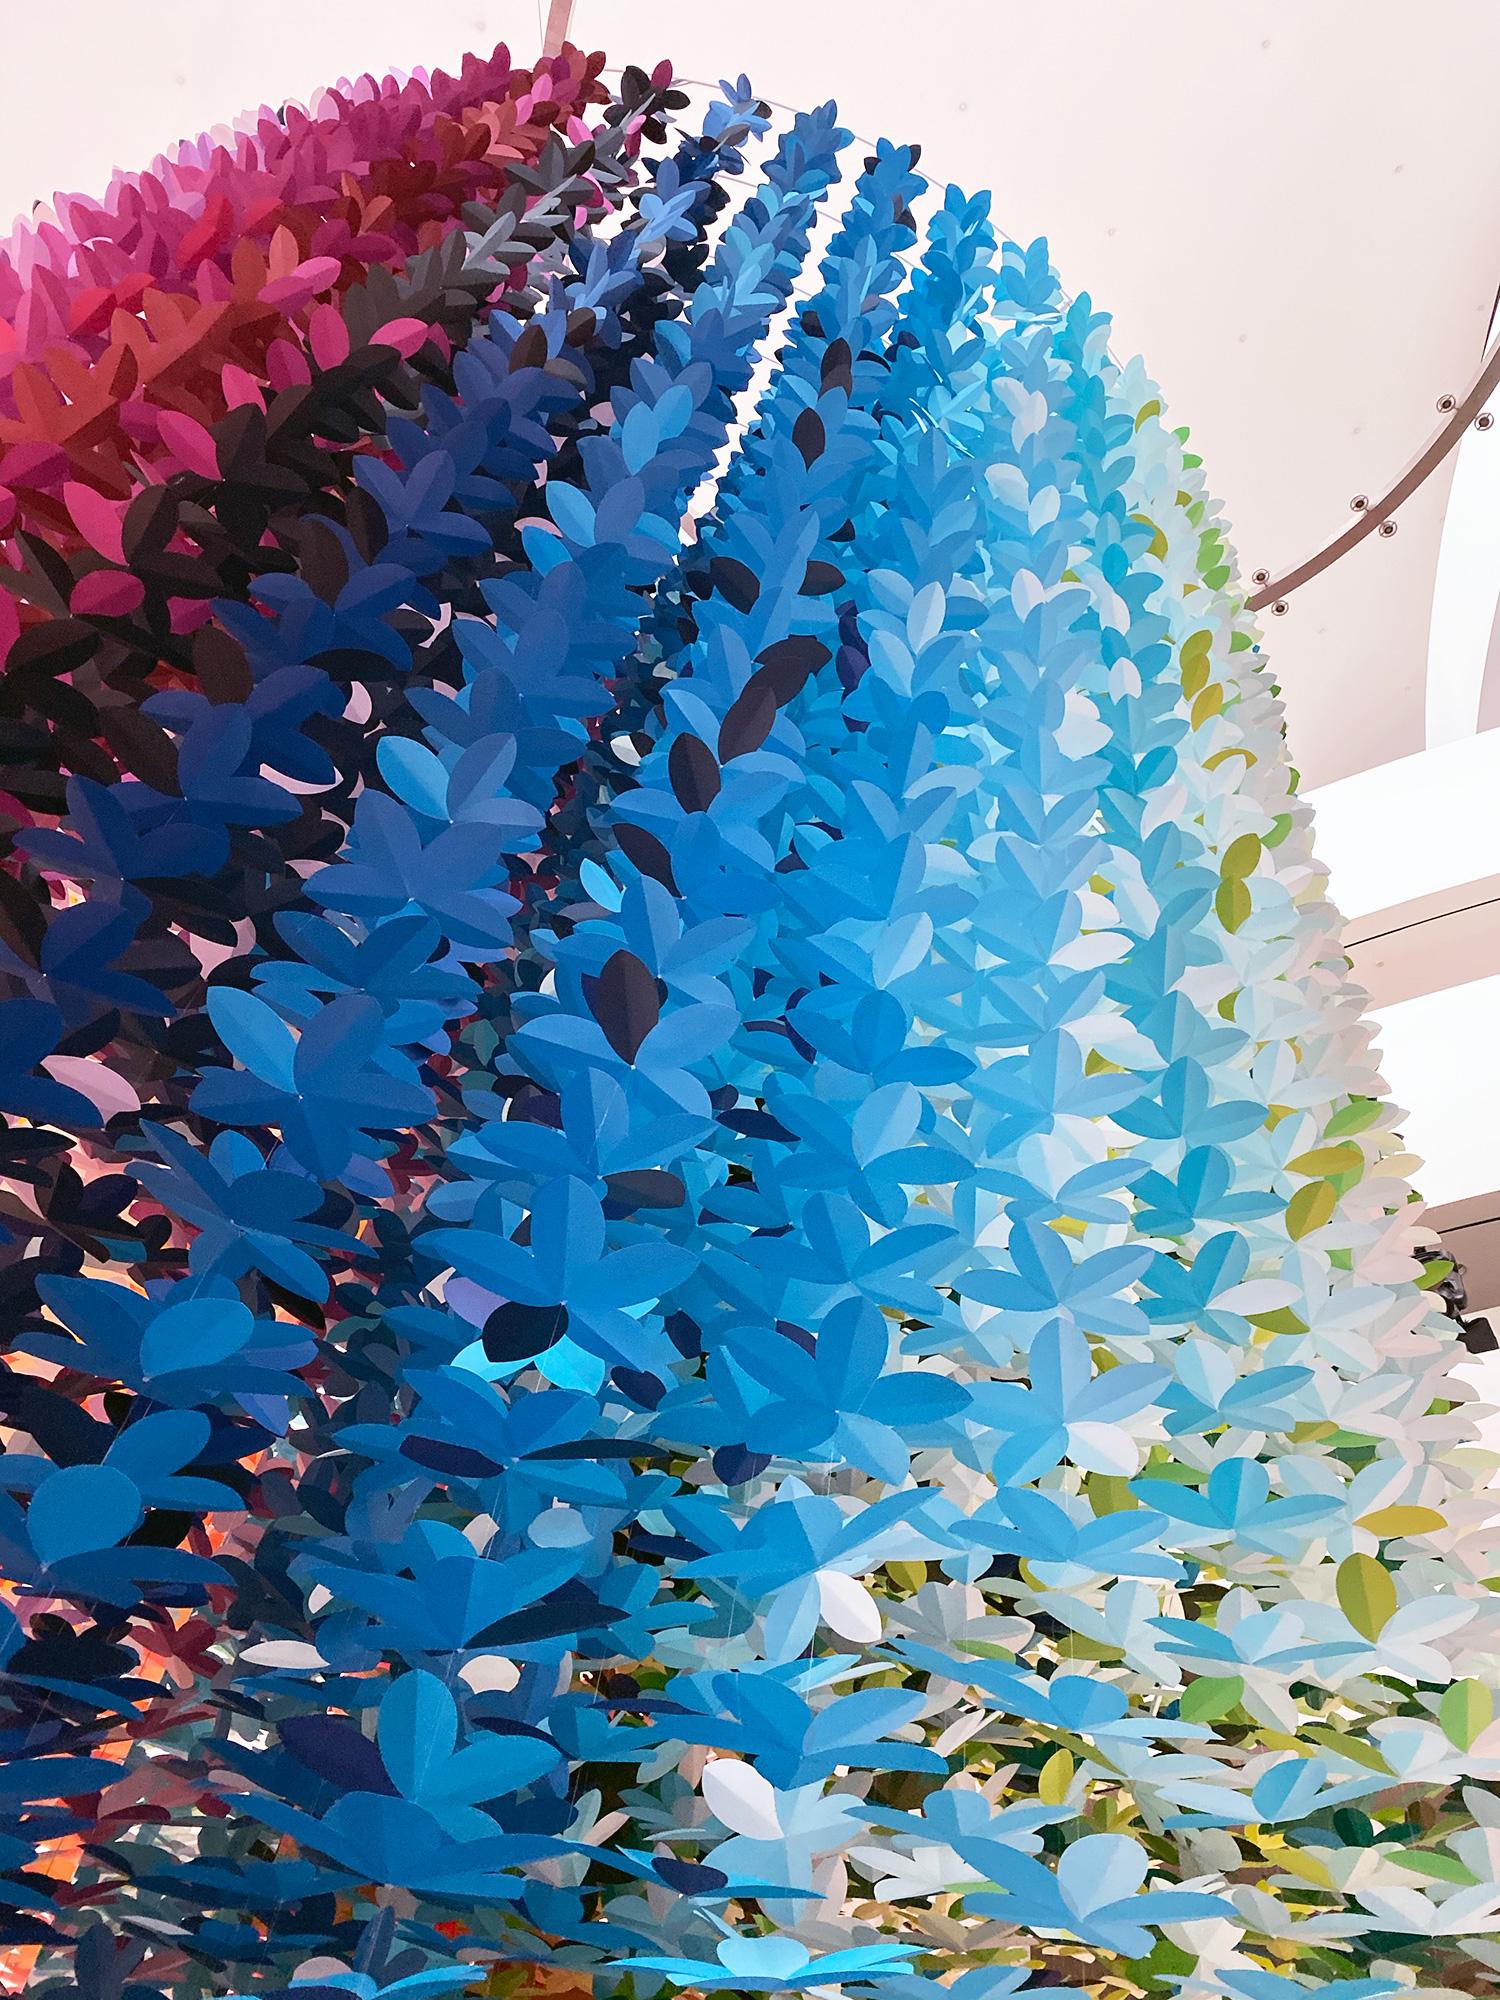 Patek Philippe Watch Art Grand Exhibition